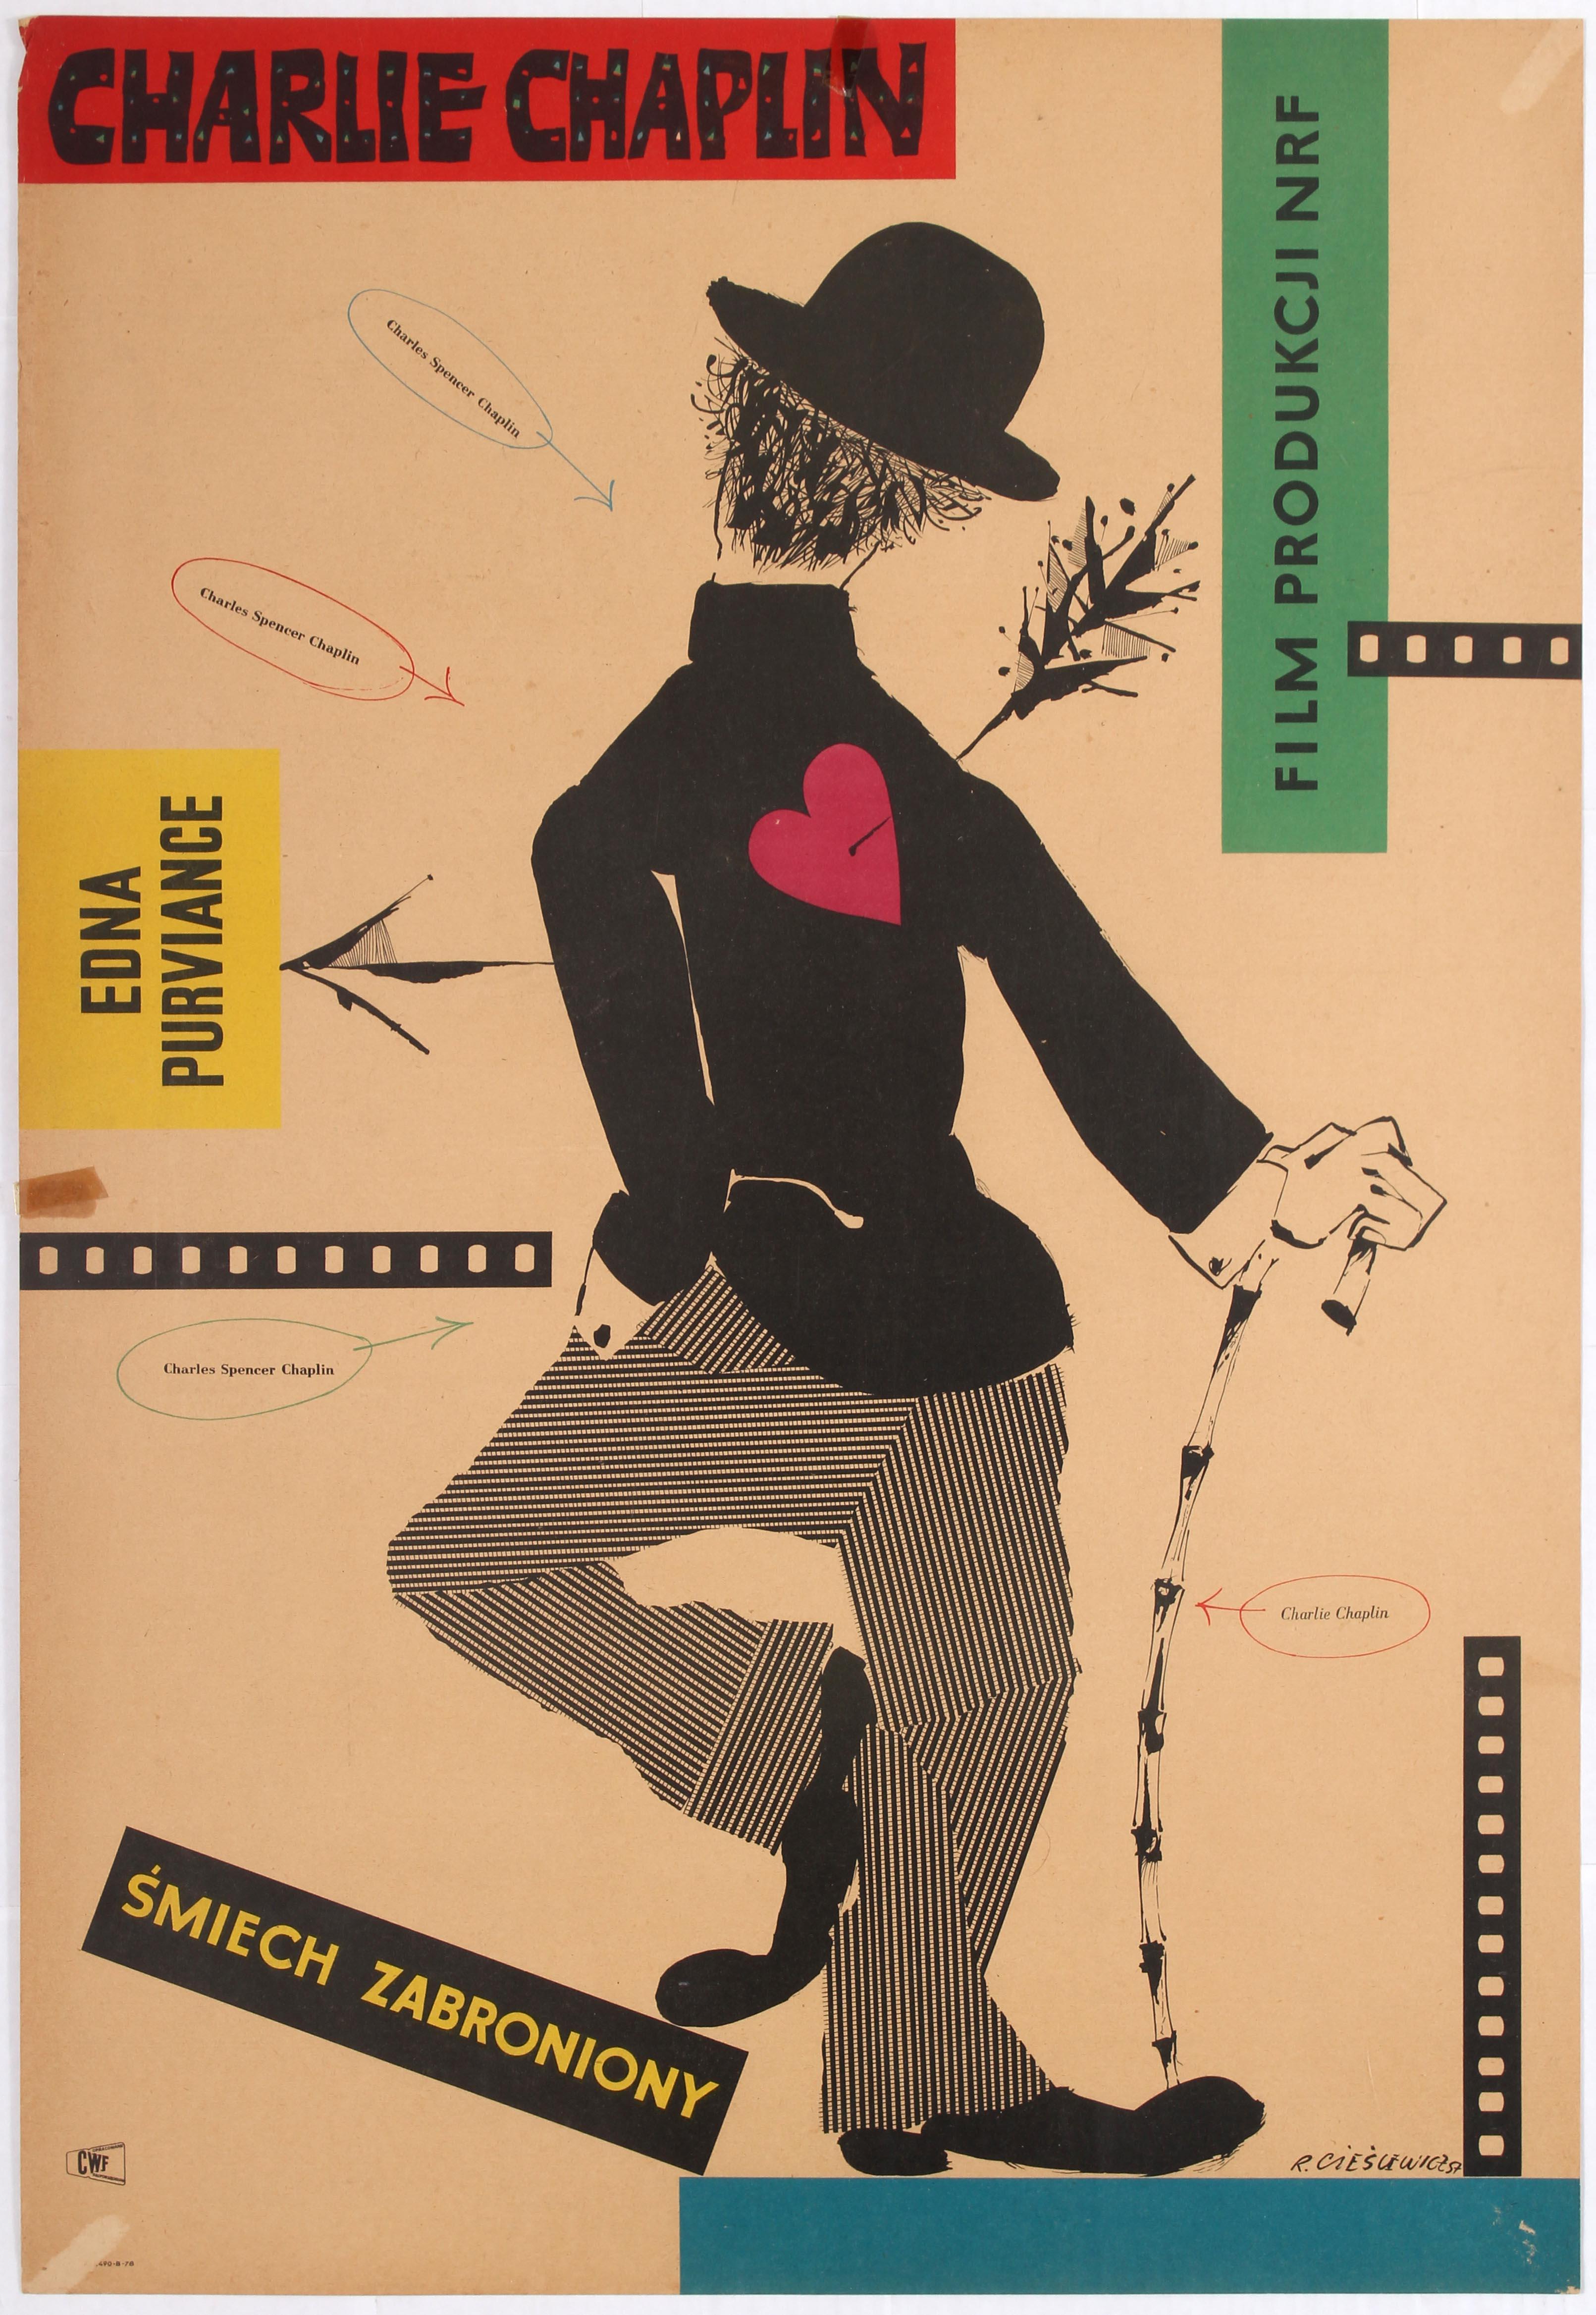 Polish Poster for a Charlie Chaplin Films Festival Smiech ...